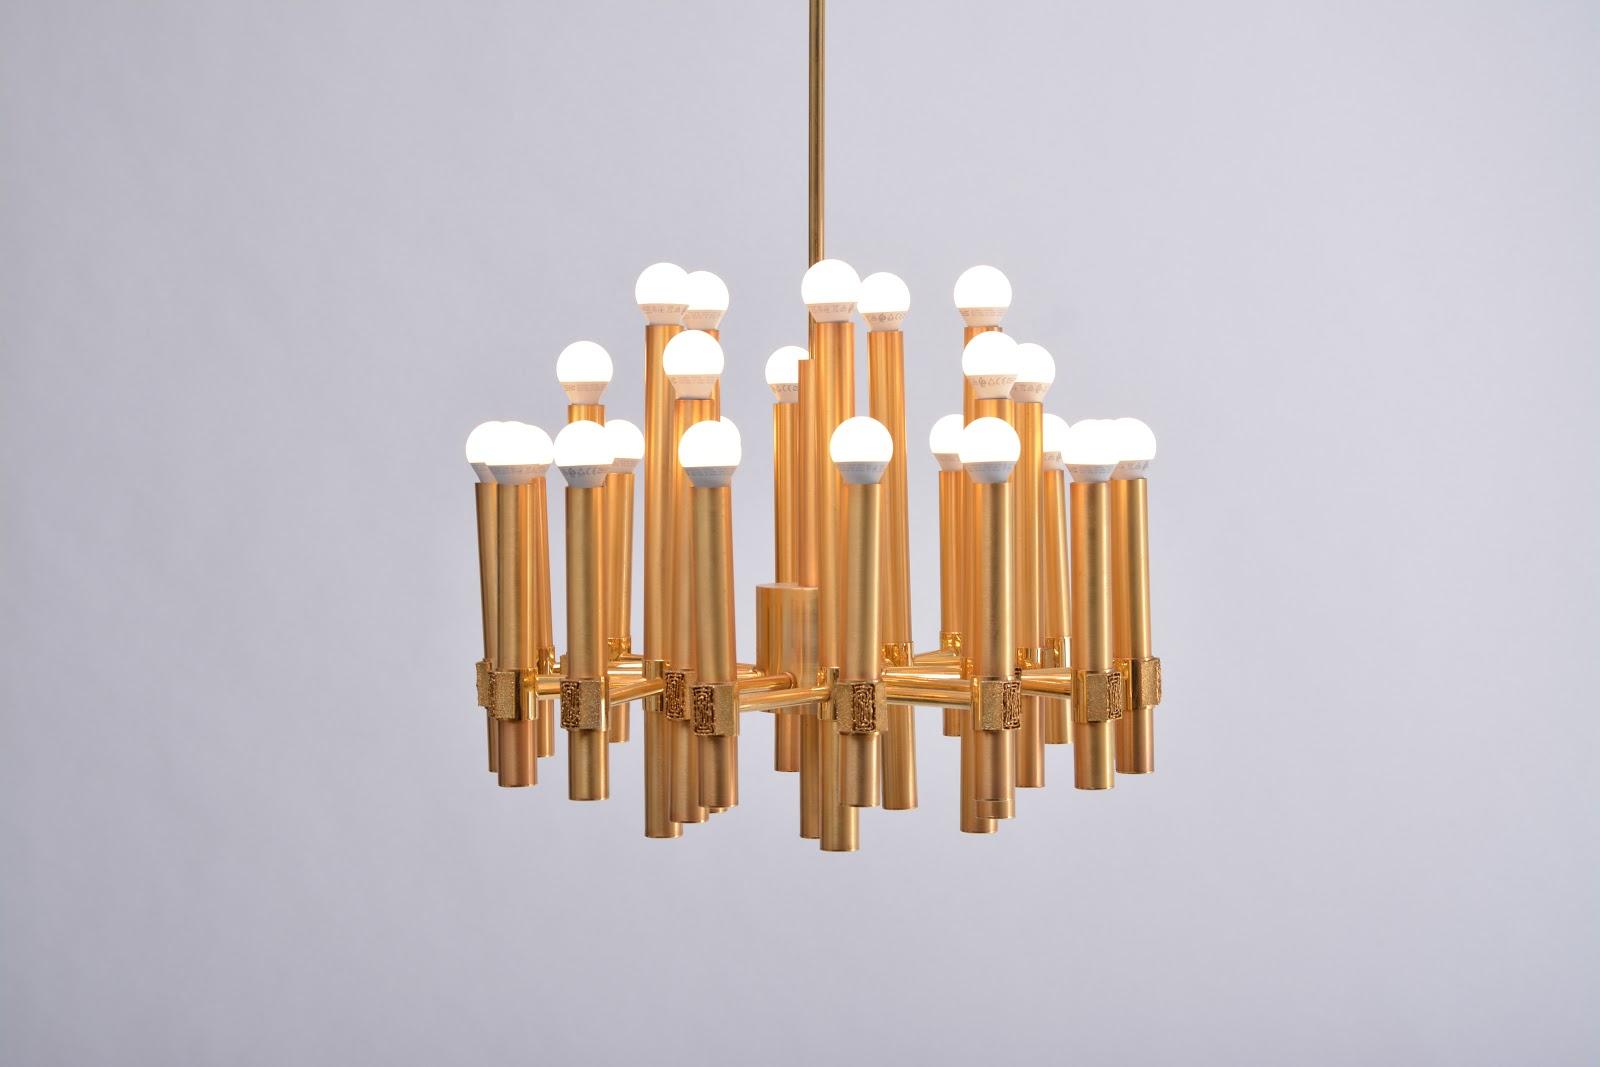 Use chandeliers to create zones | Vinterior